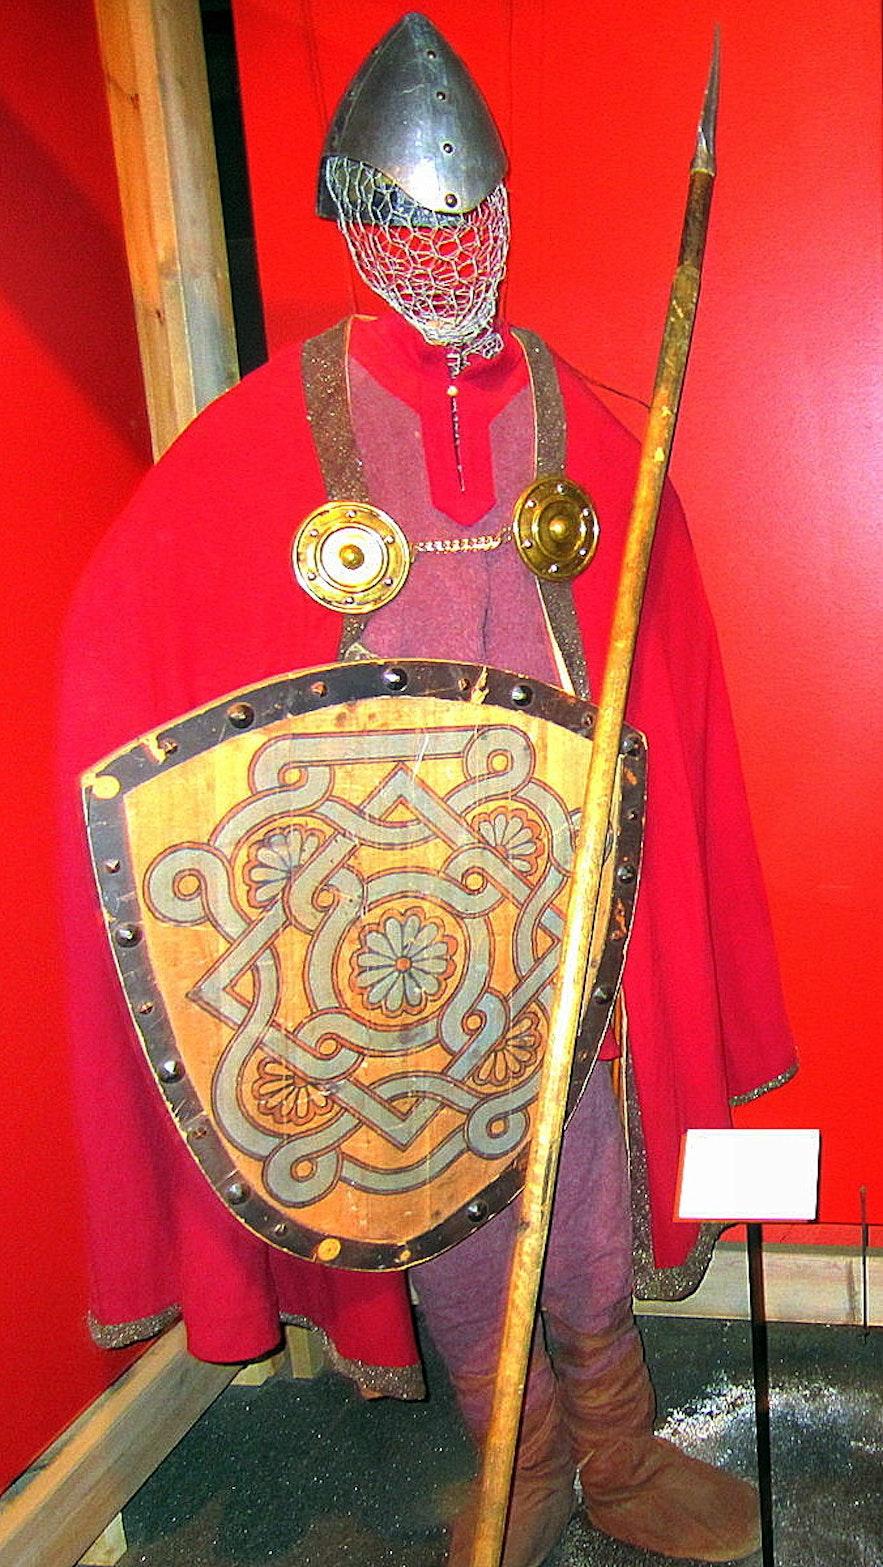 The costume of Gunnar at Hlíðarendi at the Saga Centre